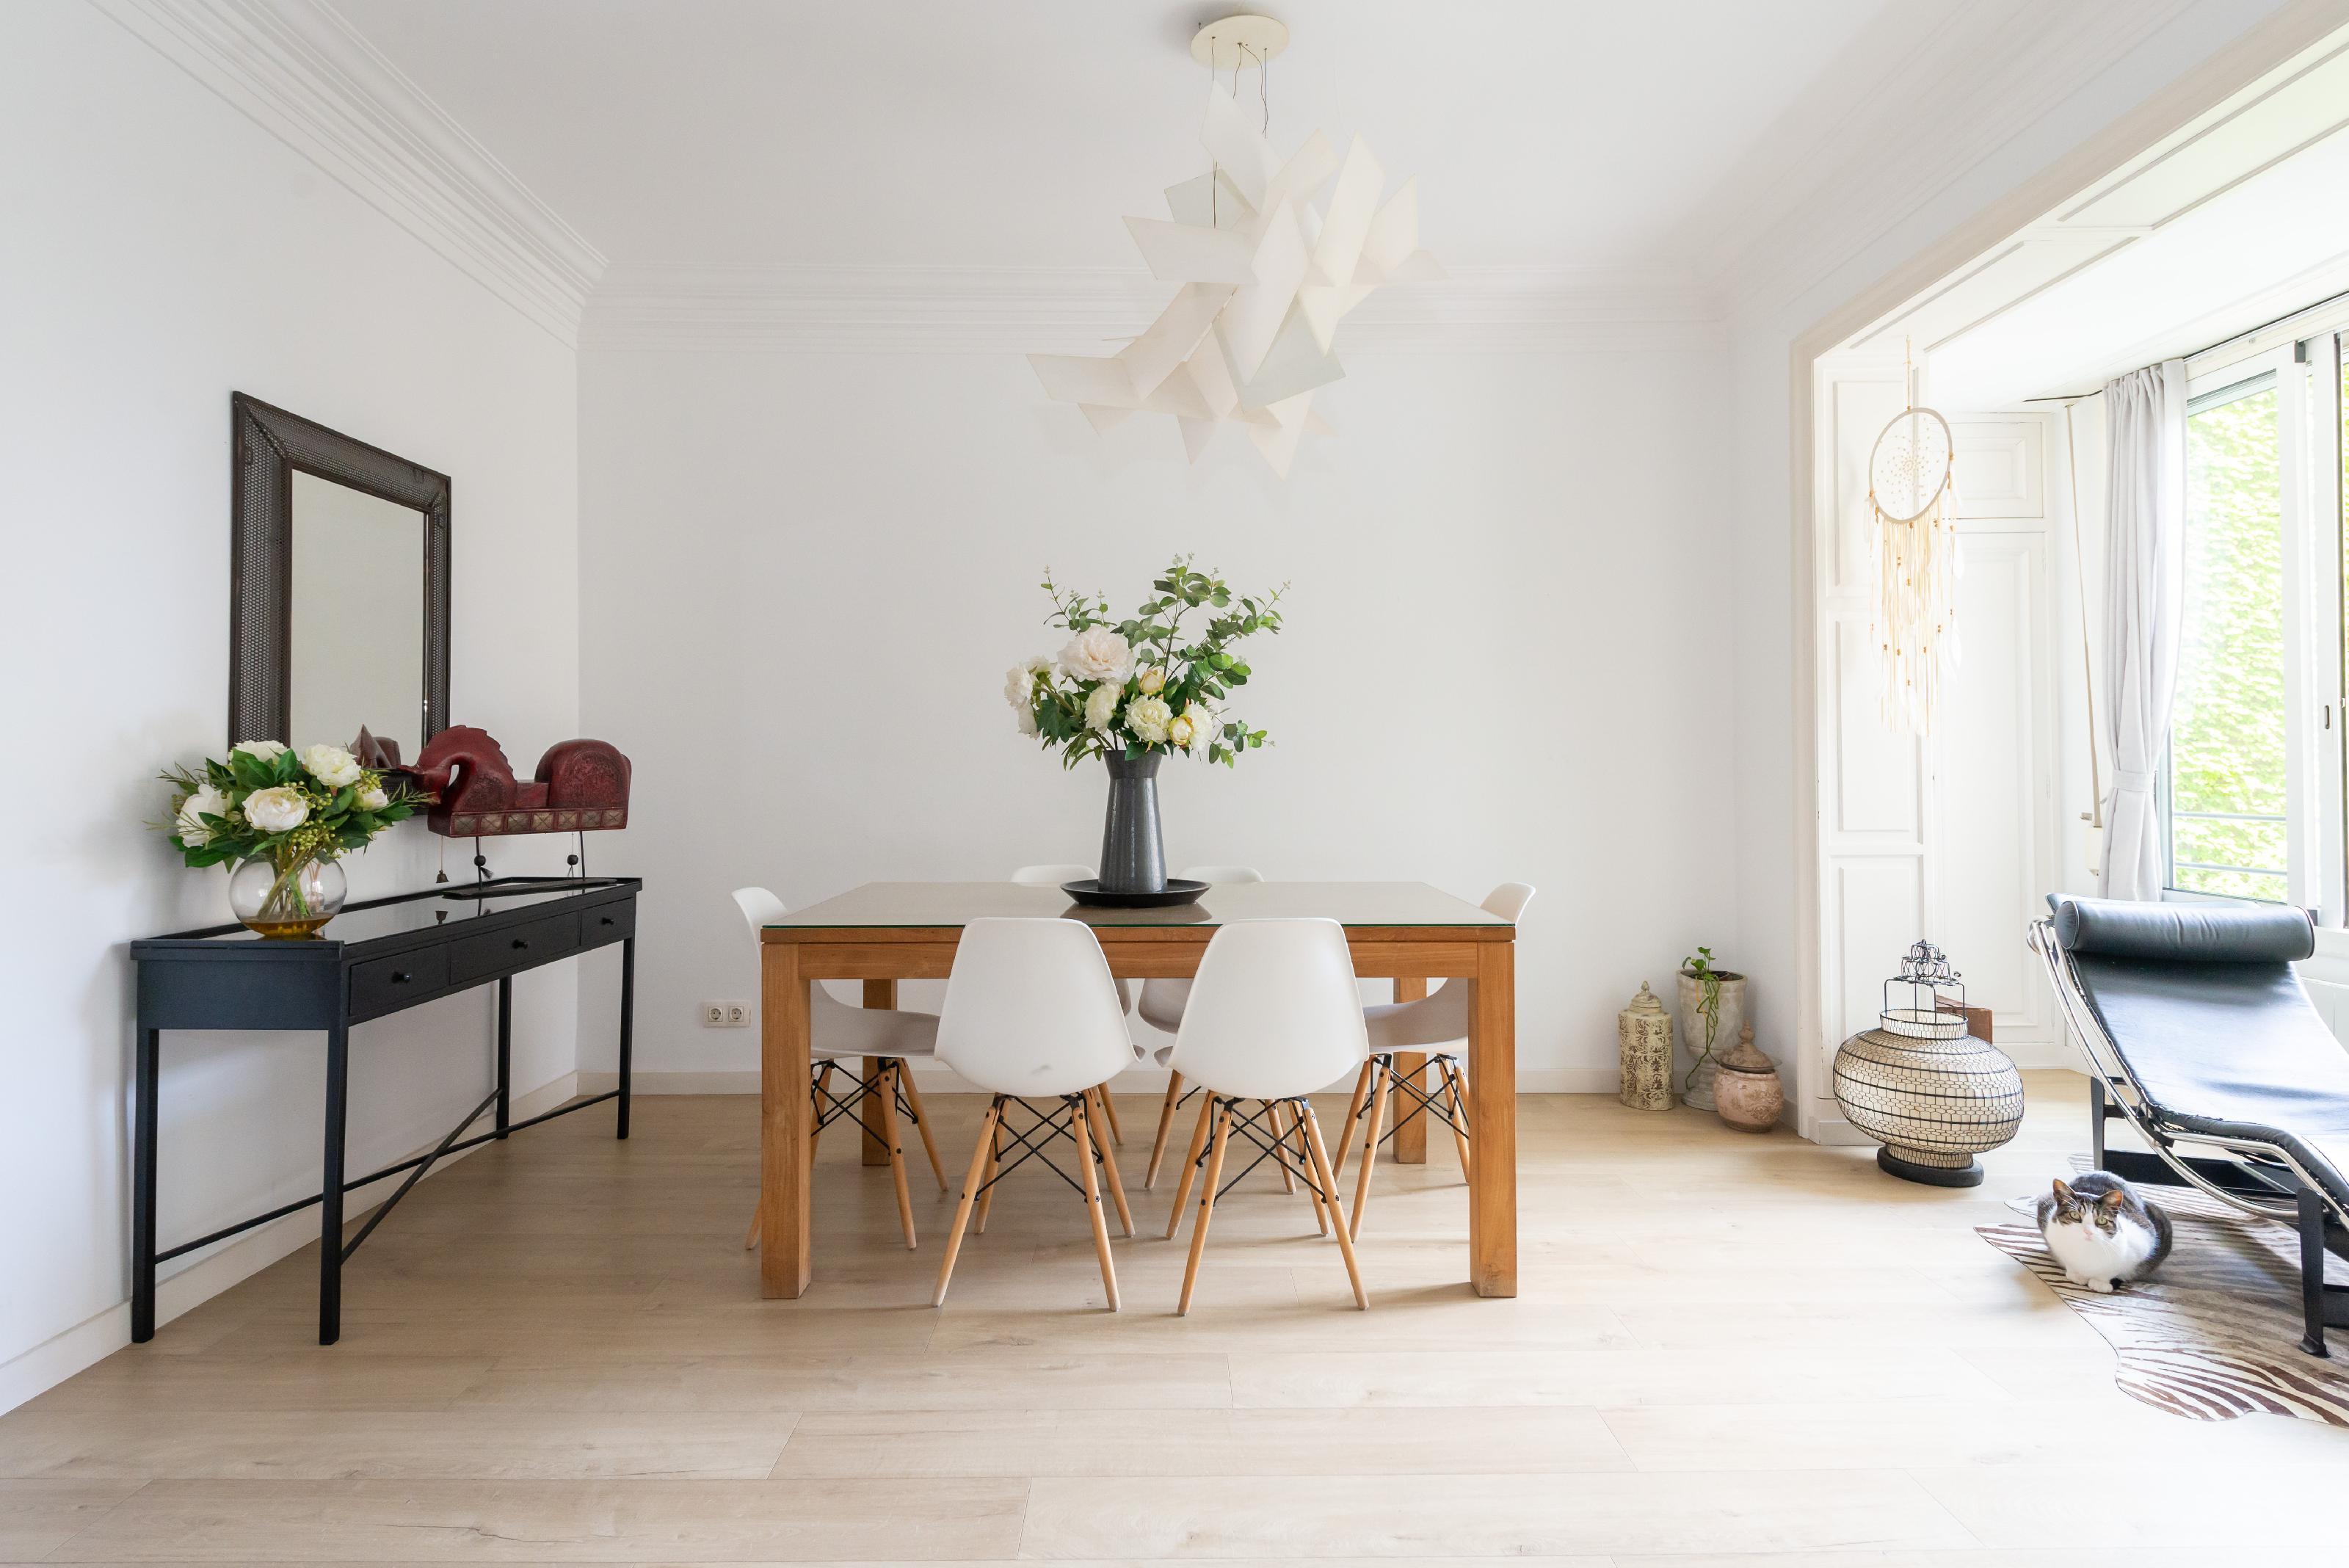 250005 Flat for sale in Sarrià-Sant Gervasi, Sant Gervasi-Galvany 11